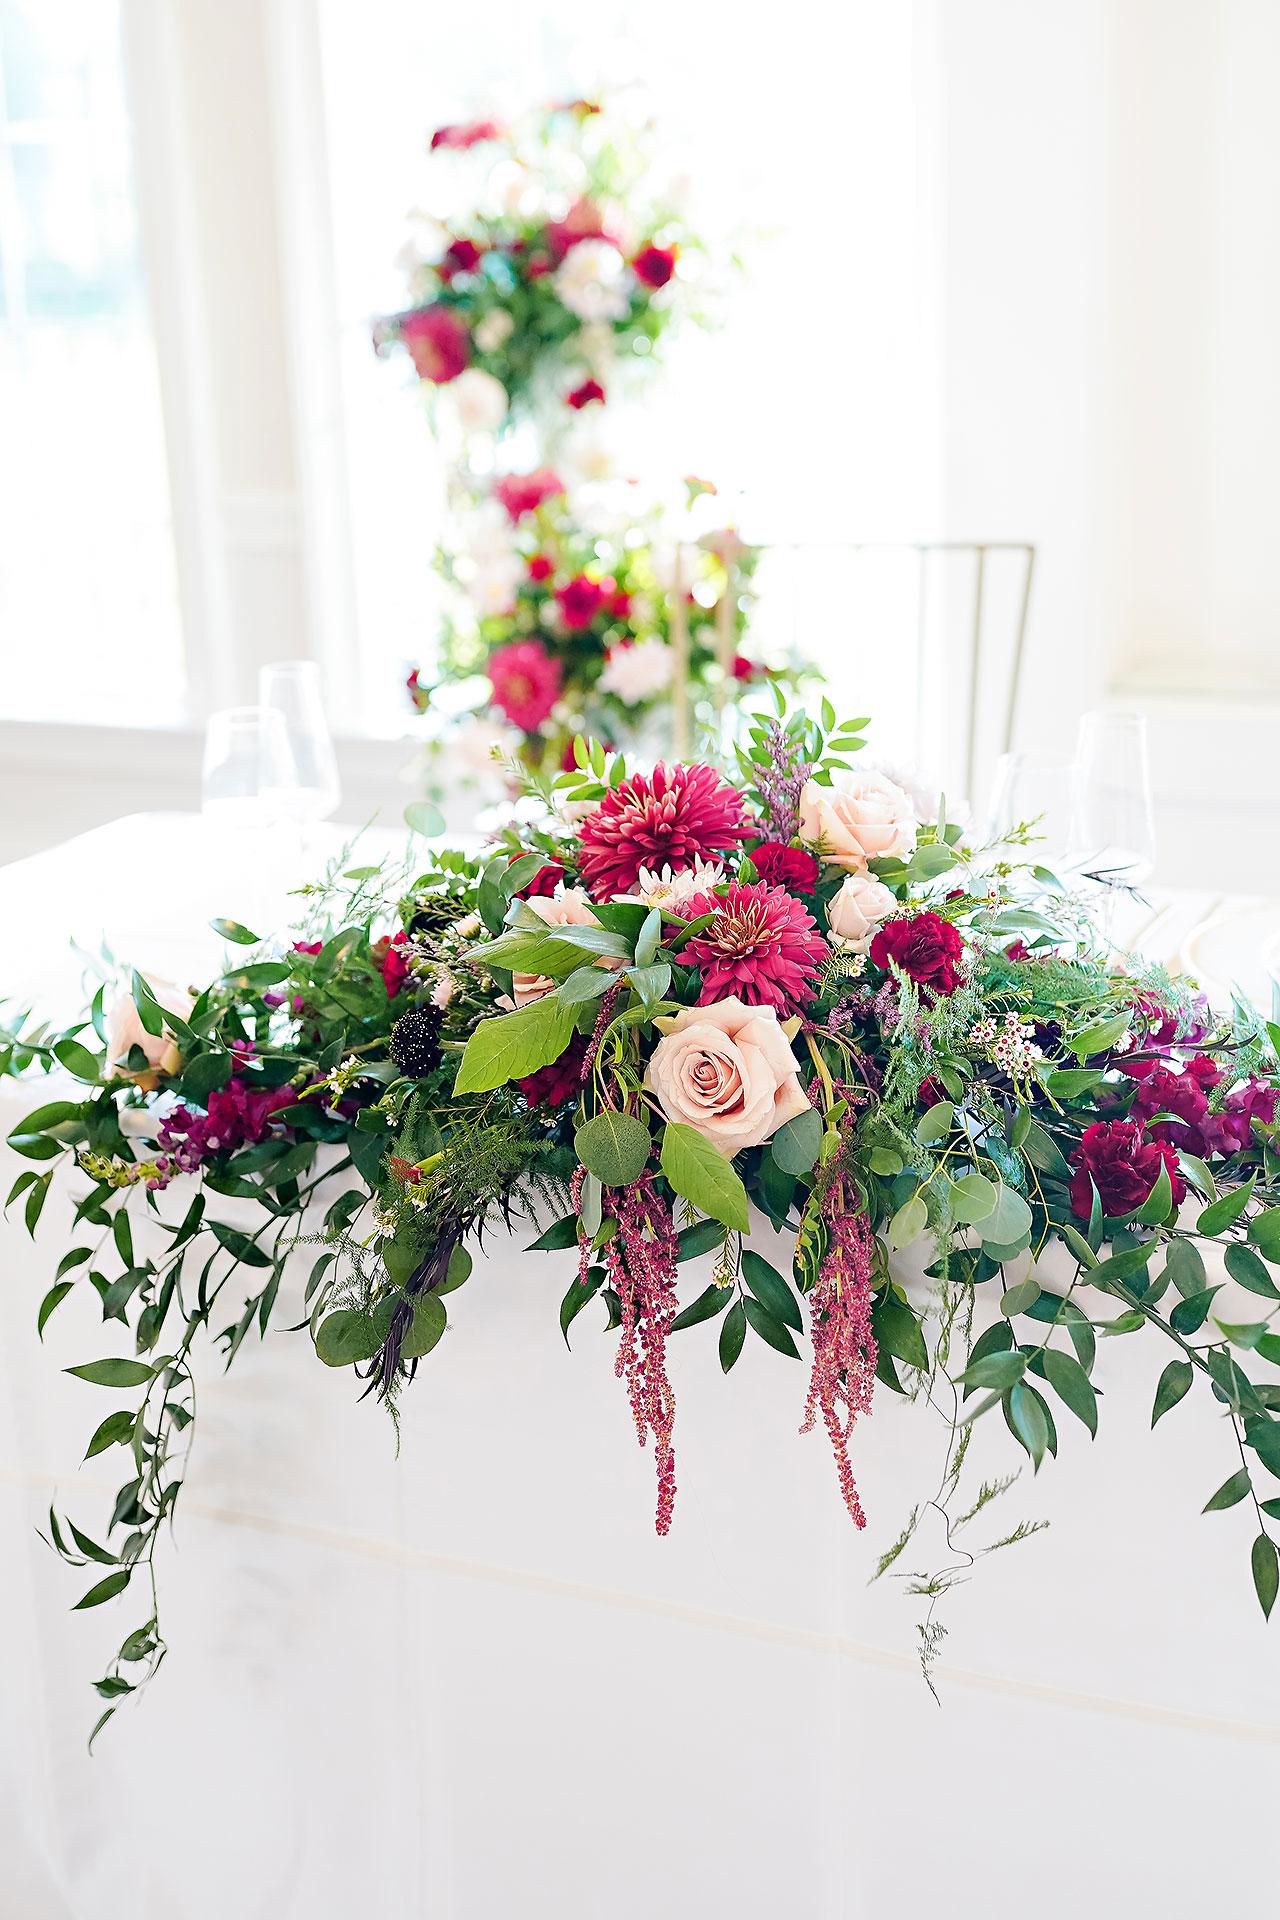 Nadia Parker Black Iris Estate Carmel Indiana Wedding May 2021 232